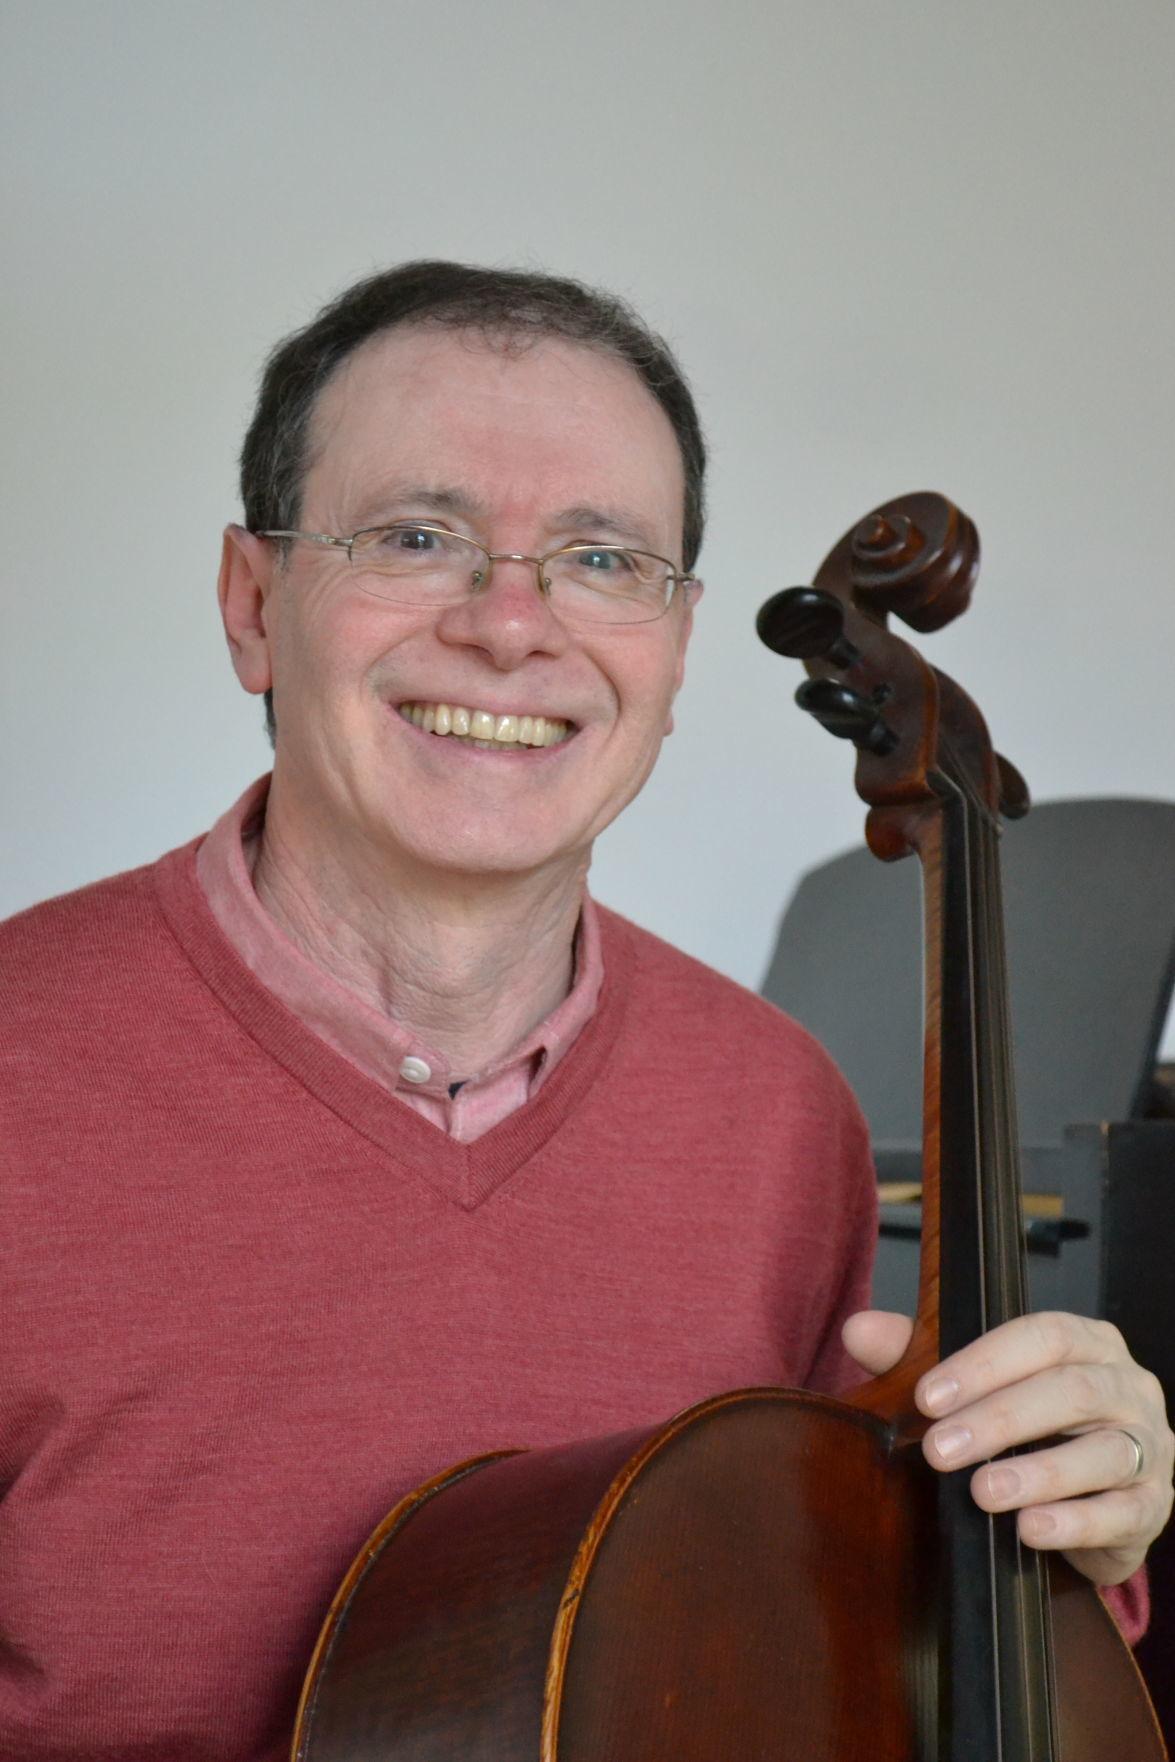 Peter Rejto